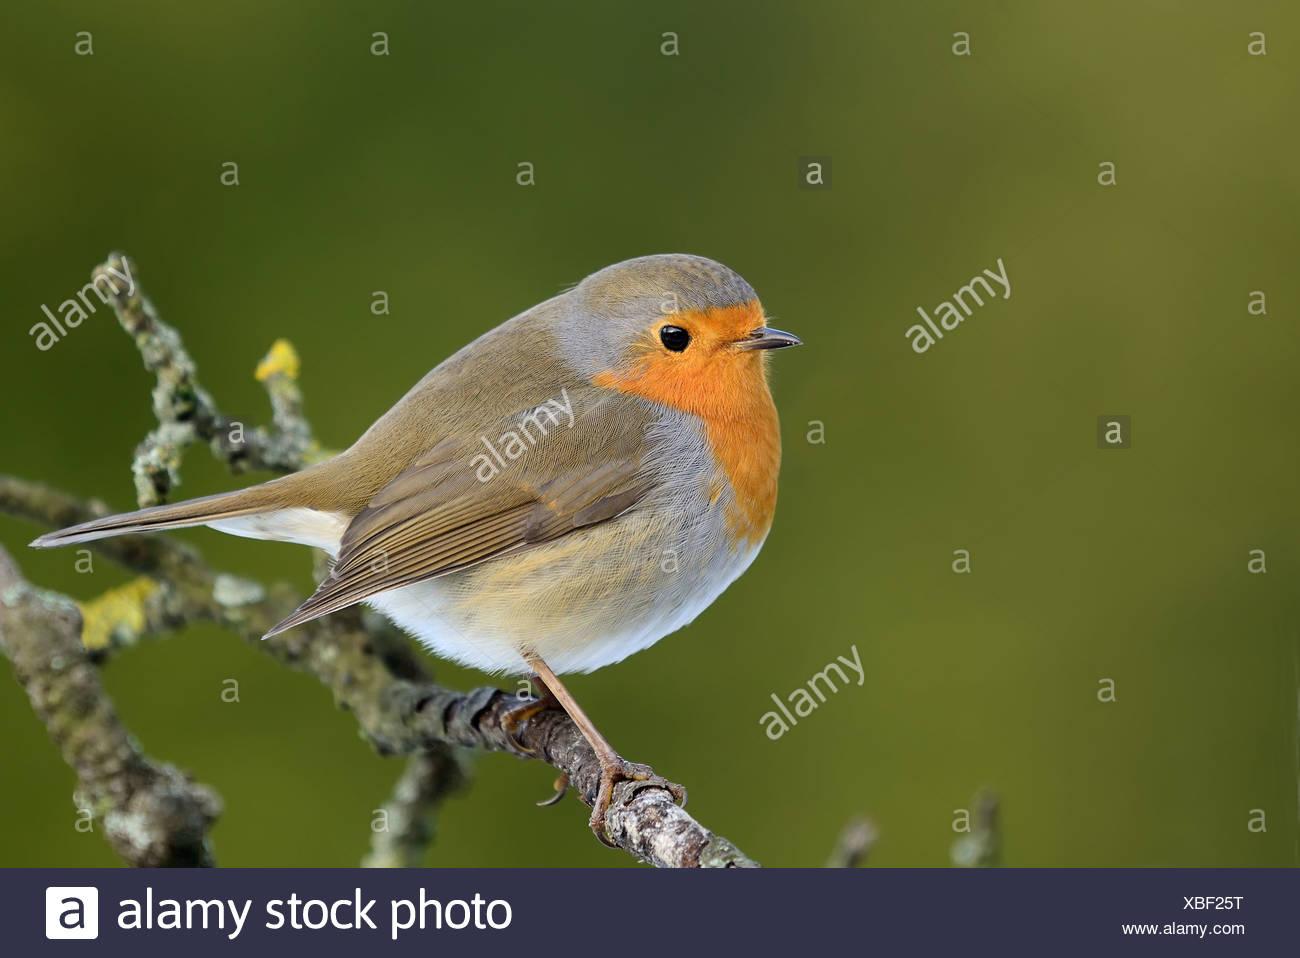 European Robin - Stock Image